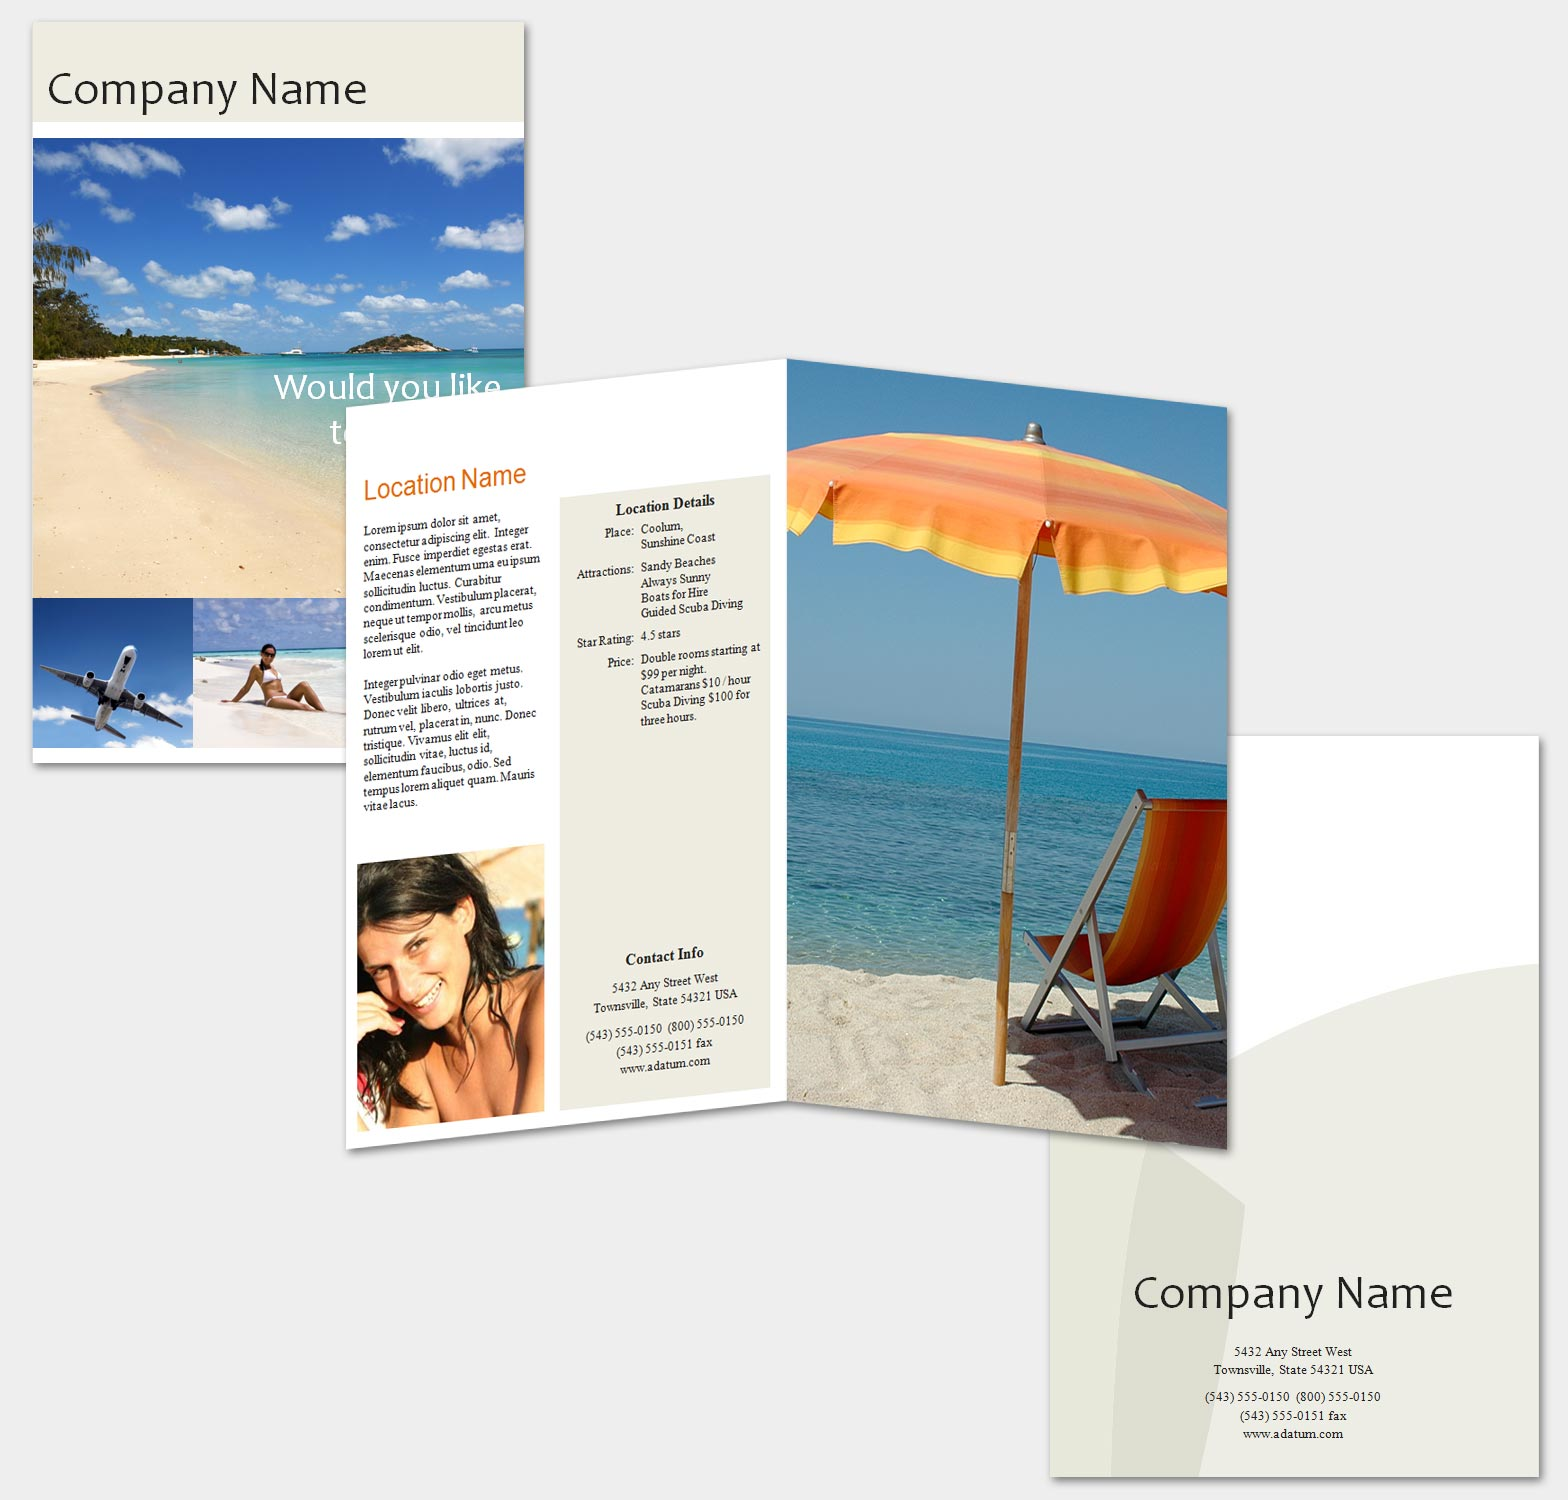 Brochure Zafira Pics Indesign Brochure Templates: Brochure Zafira Pics: Brochure Templates